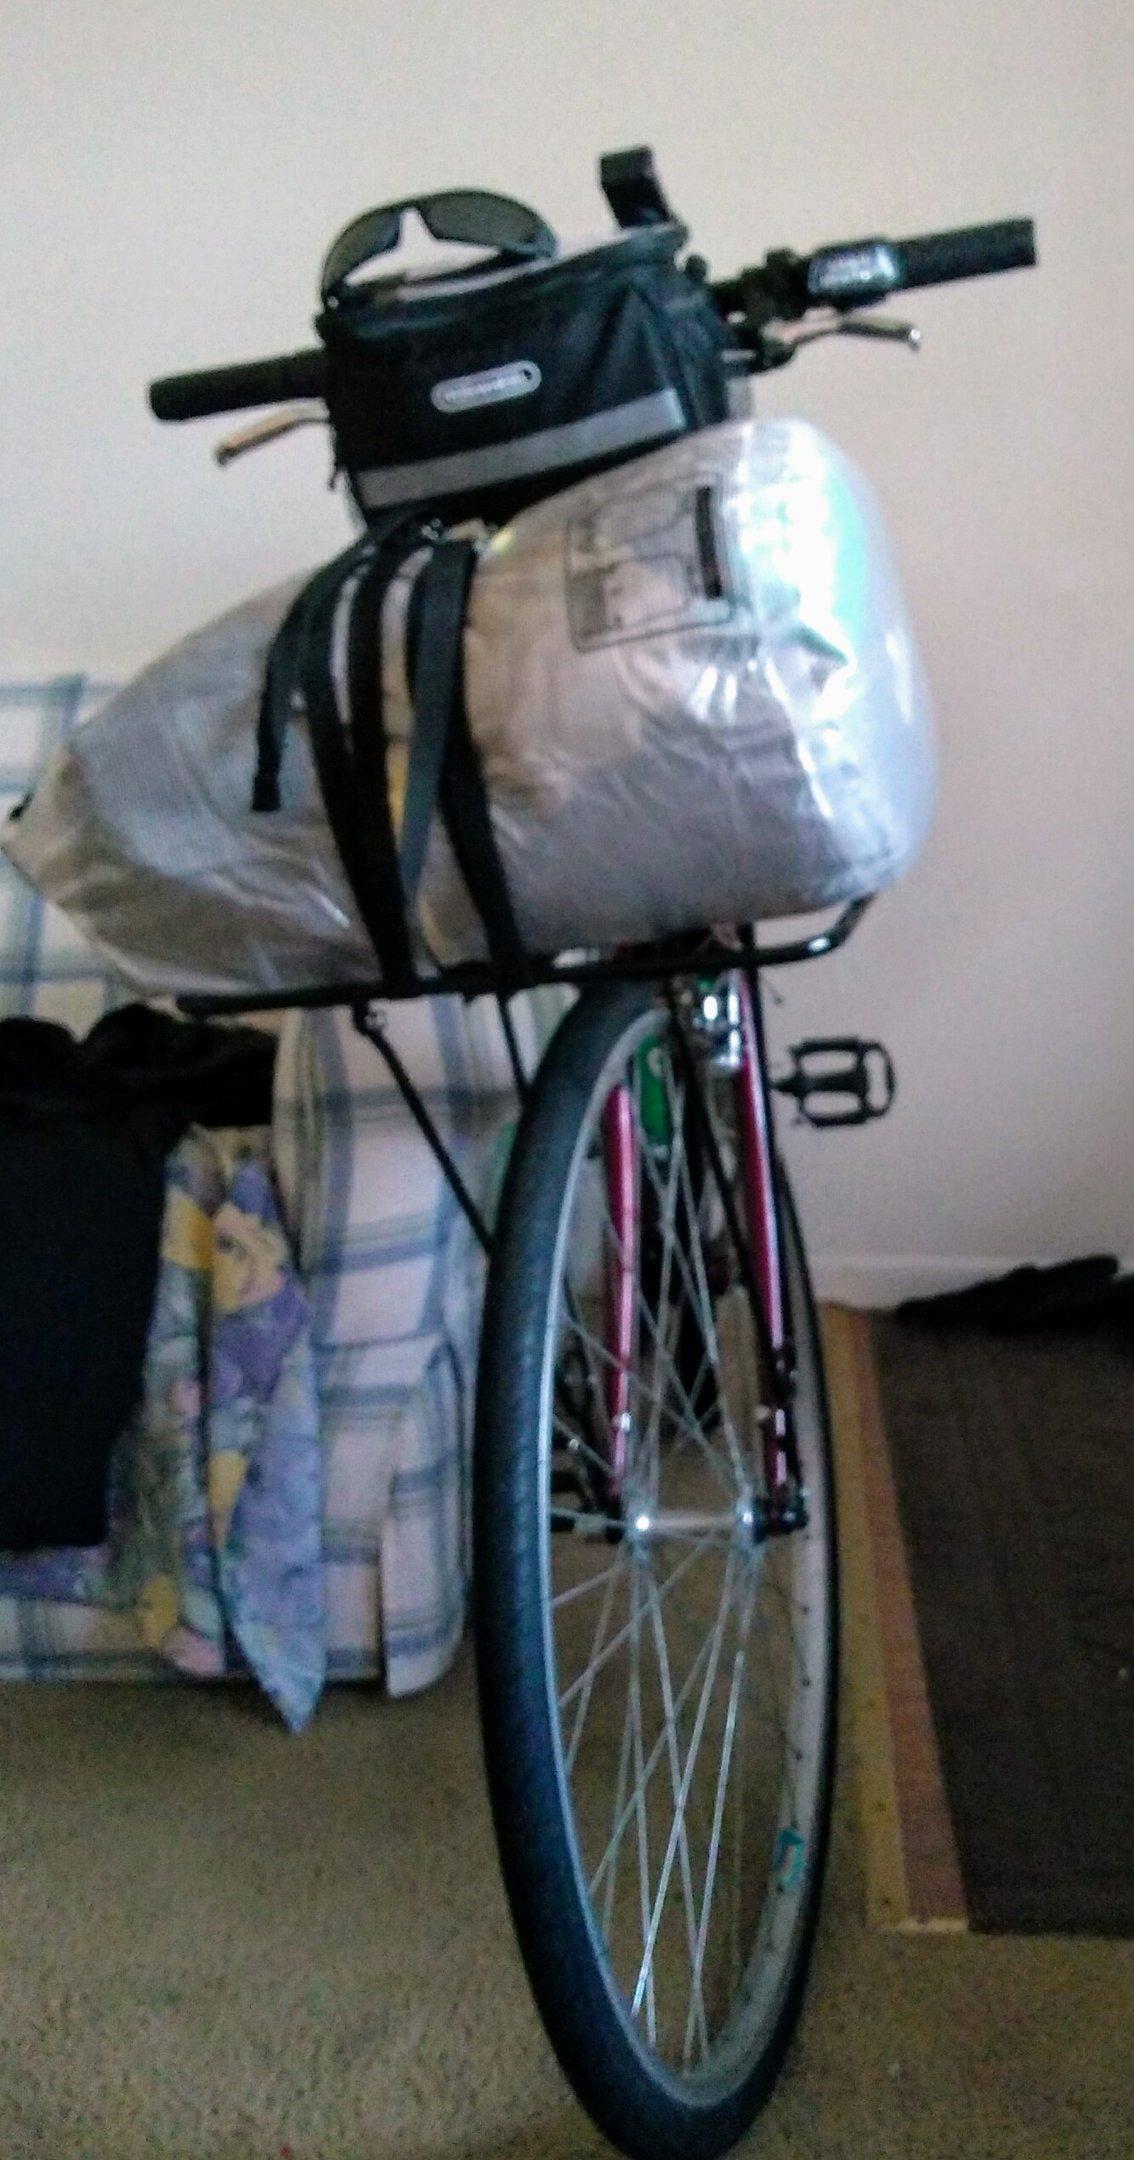 img_20180613_101325785_2-jpg.43844_Budget gear for a bike tour_Bike Touring_Squat the Planet_3:20 PM